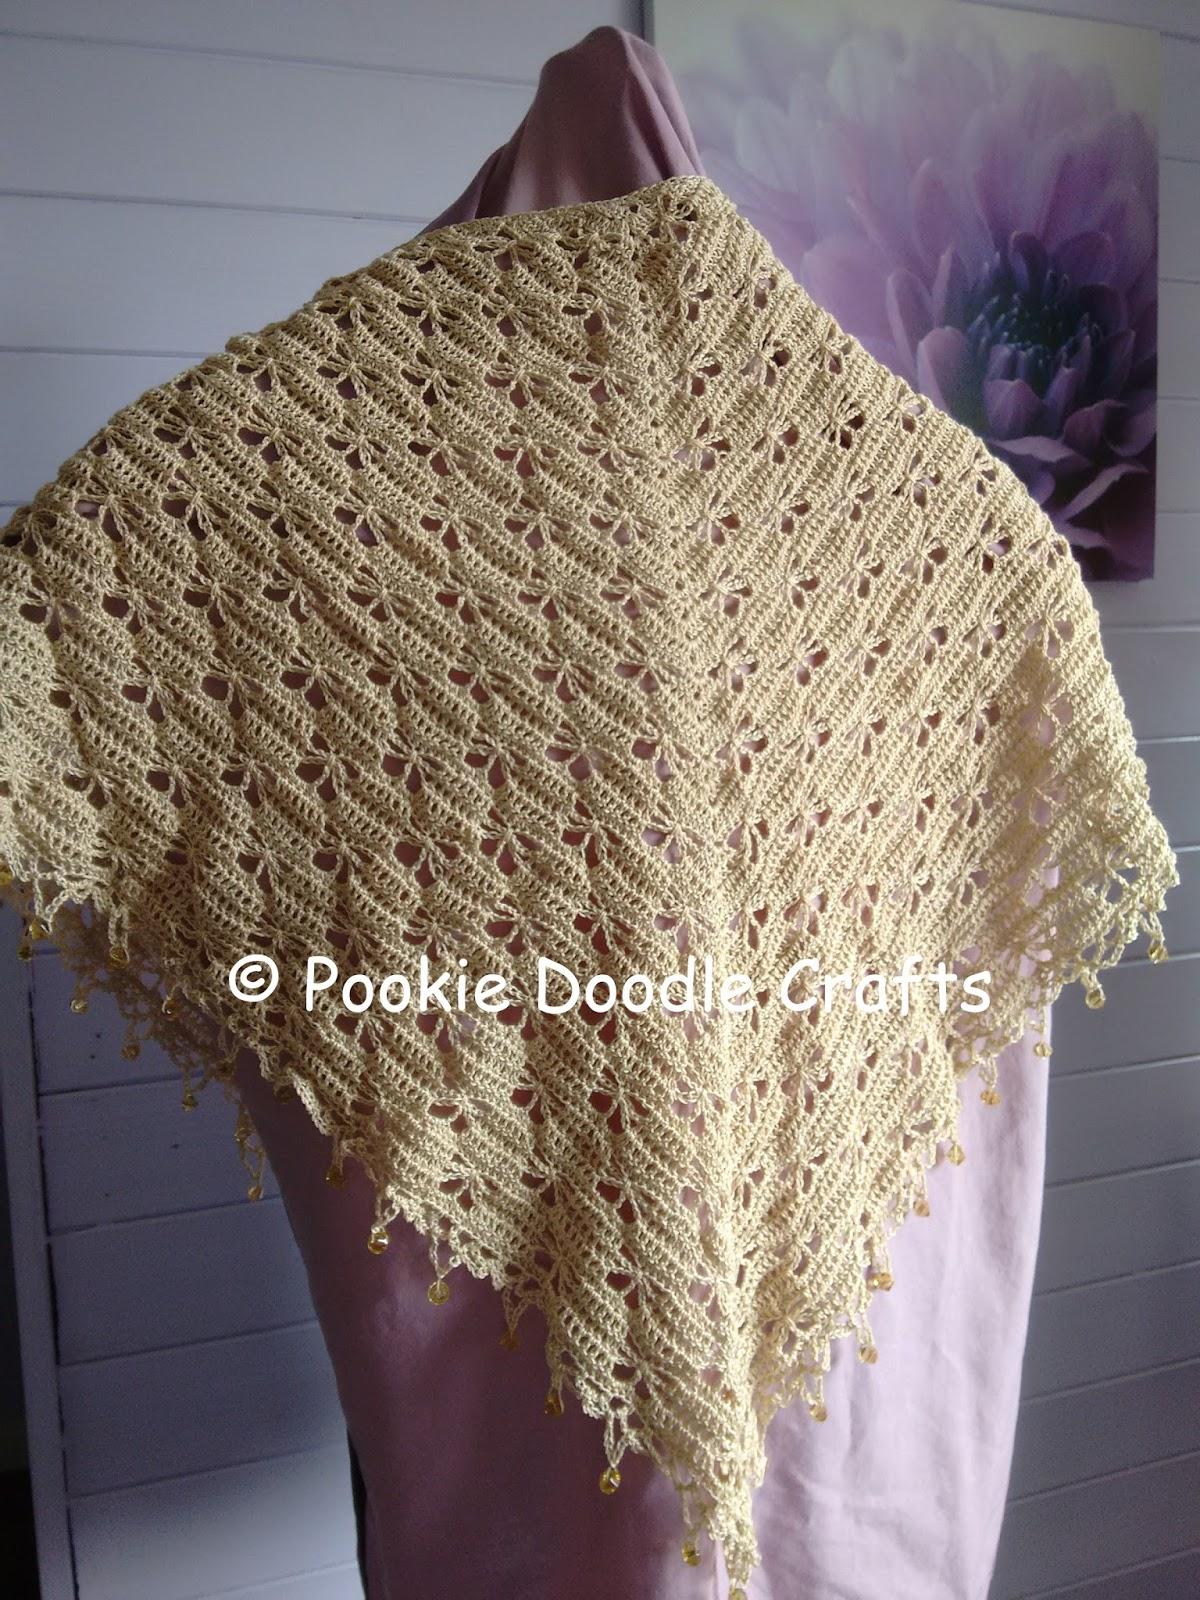 Crochet Butterfly Shawl Free Pattern : Pookie Doodle Crafts: Butterfly Stitch Crochet Shawl